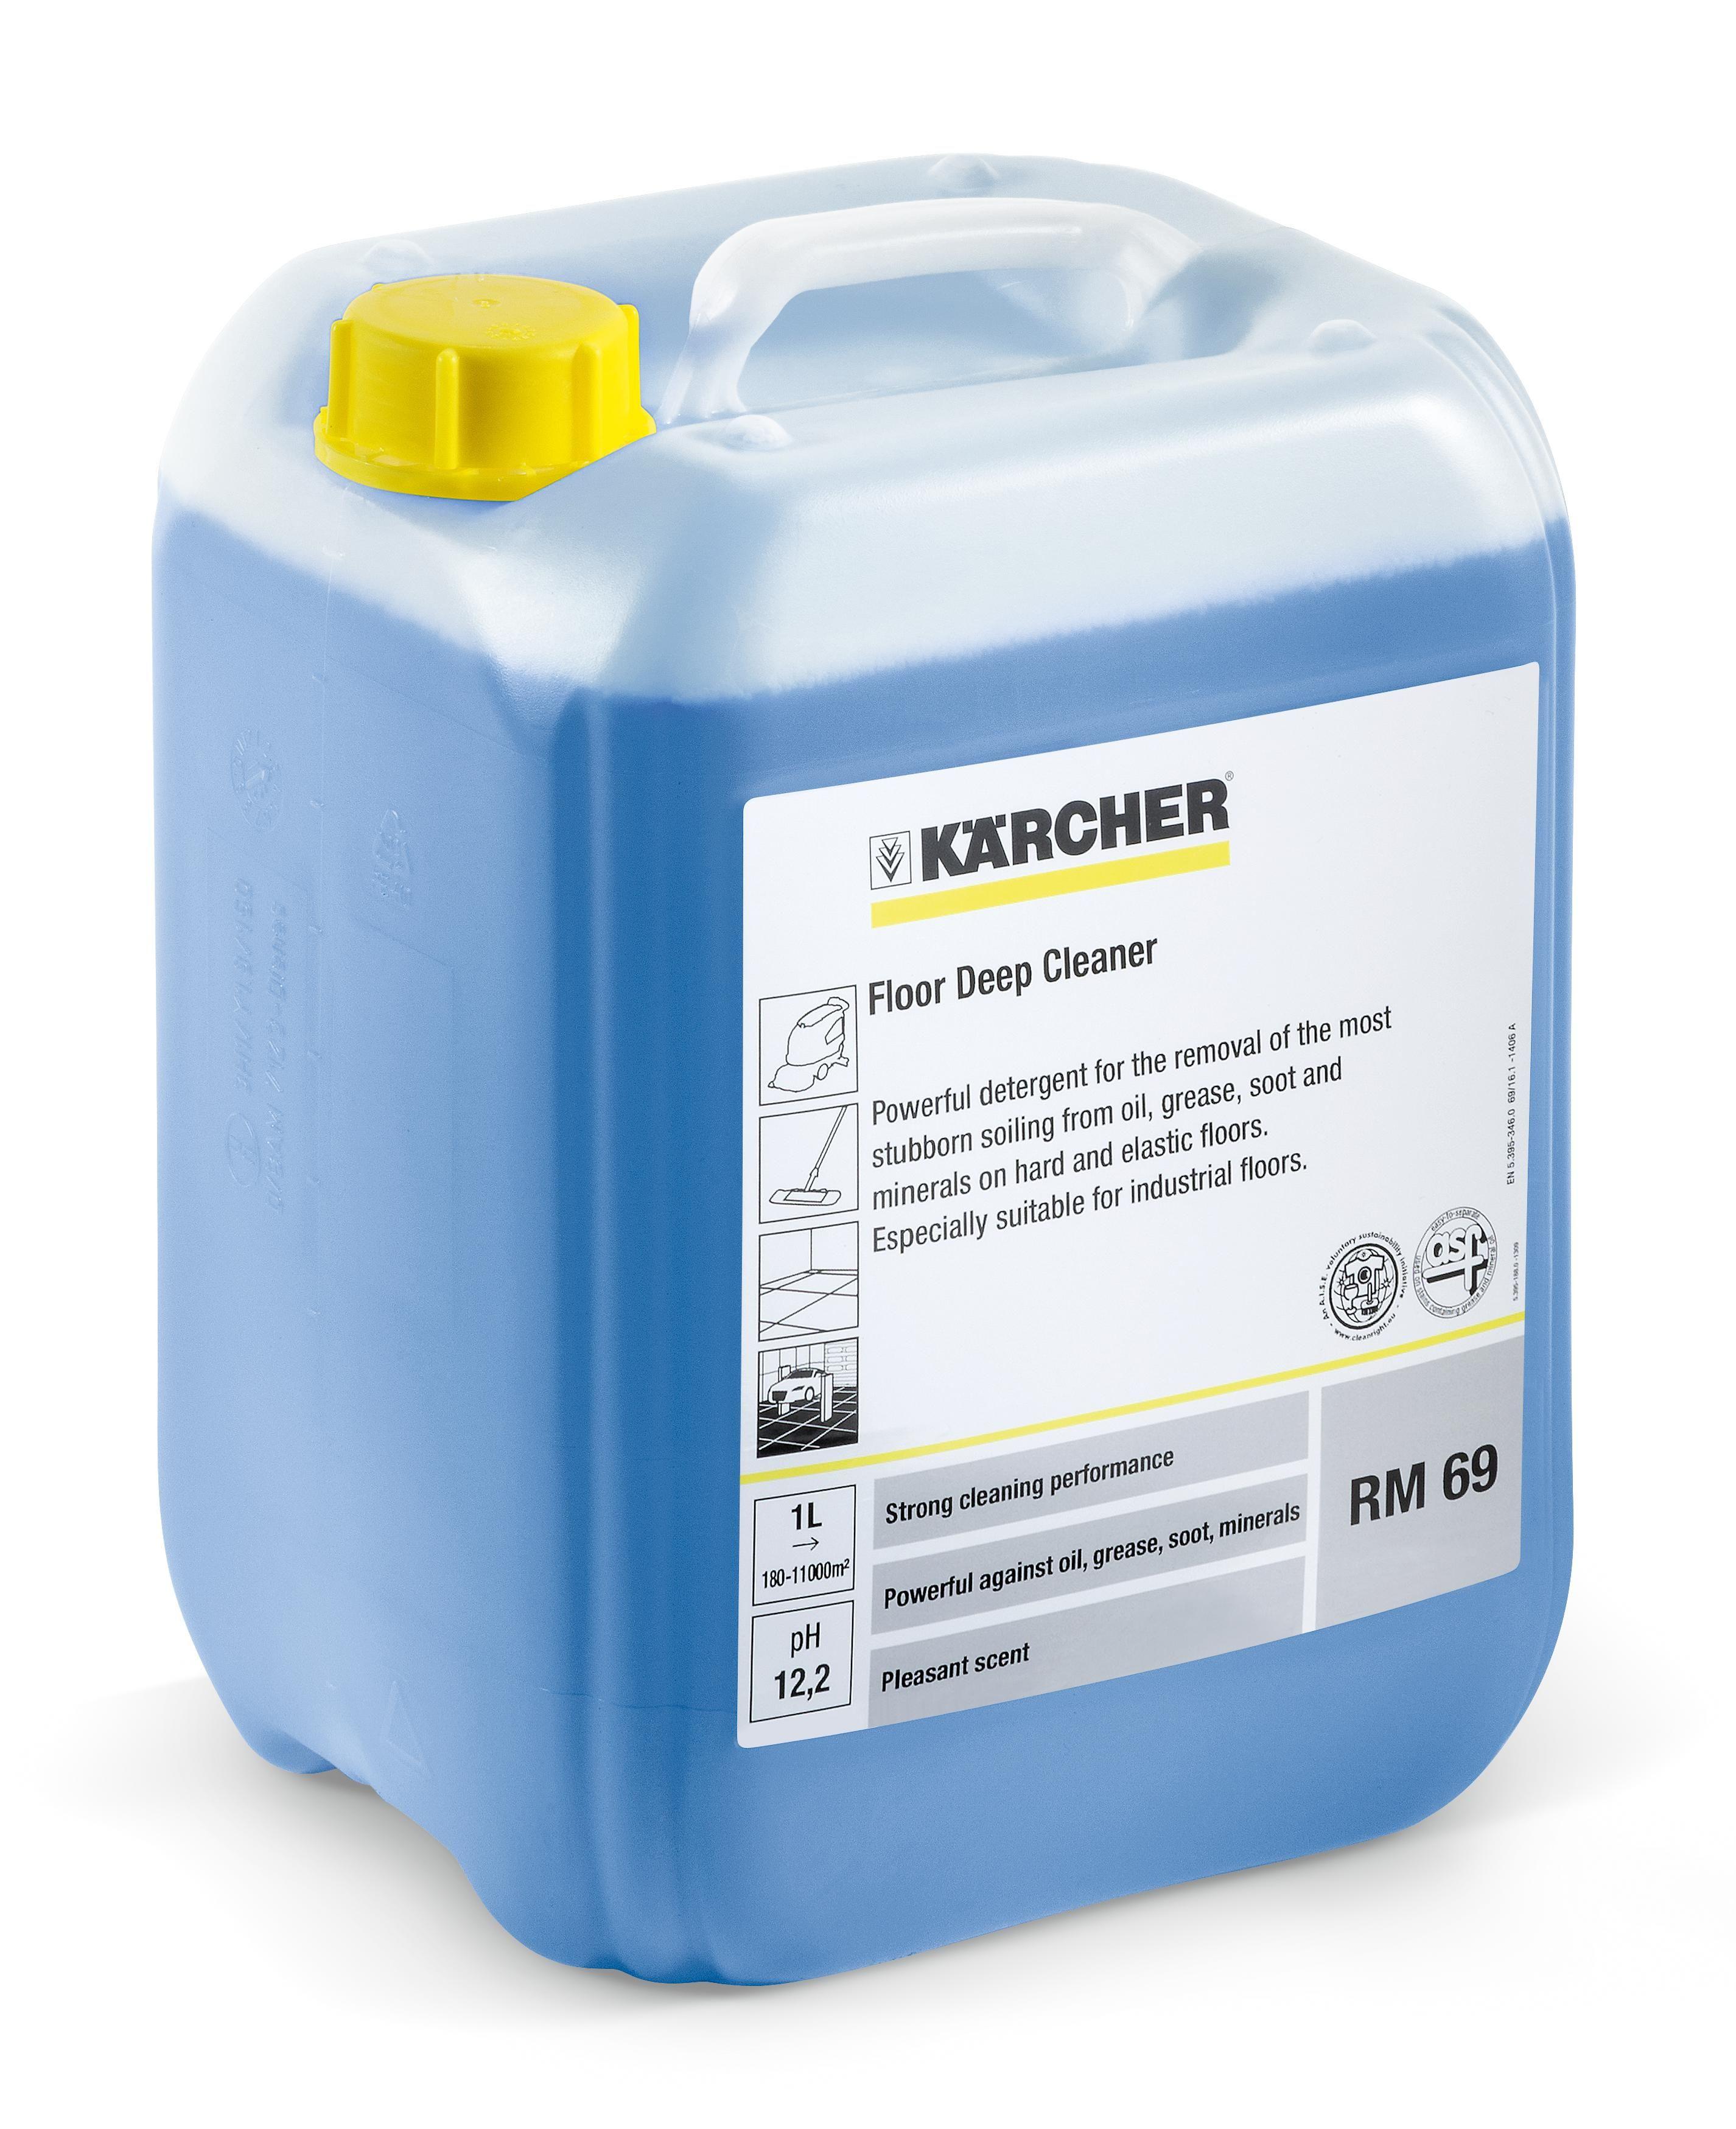 Kärcher Rengjøring RM 69 ASF 10L (flaske med 10 l) 6.295-120.0